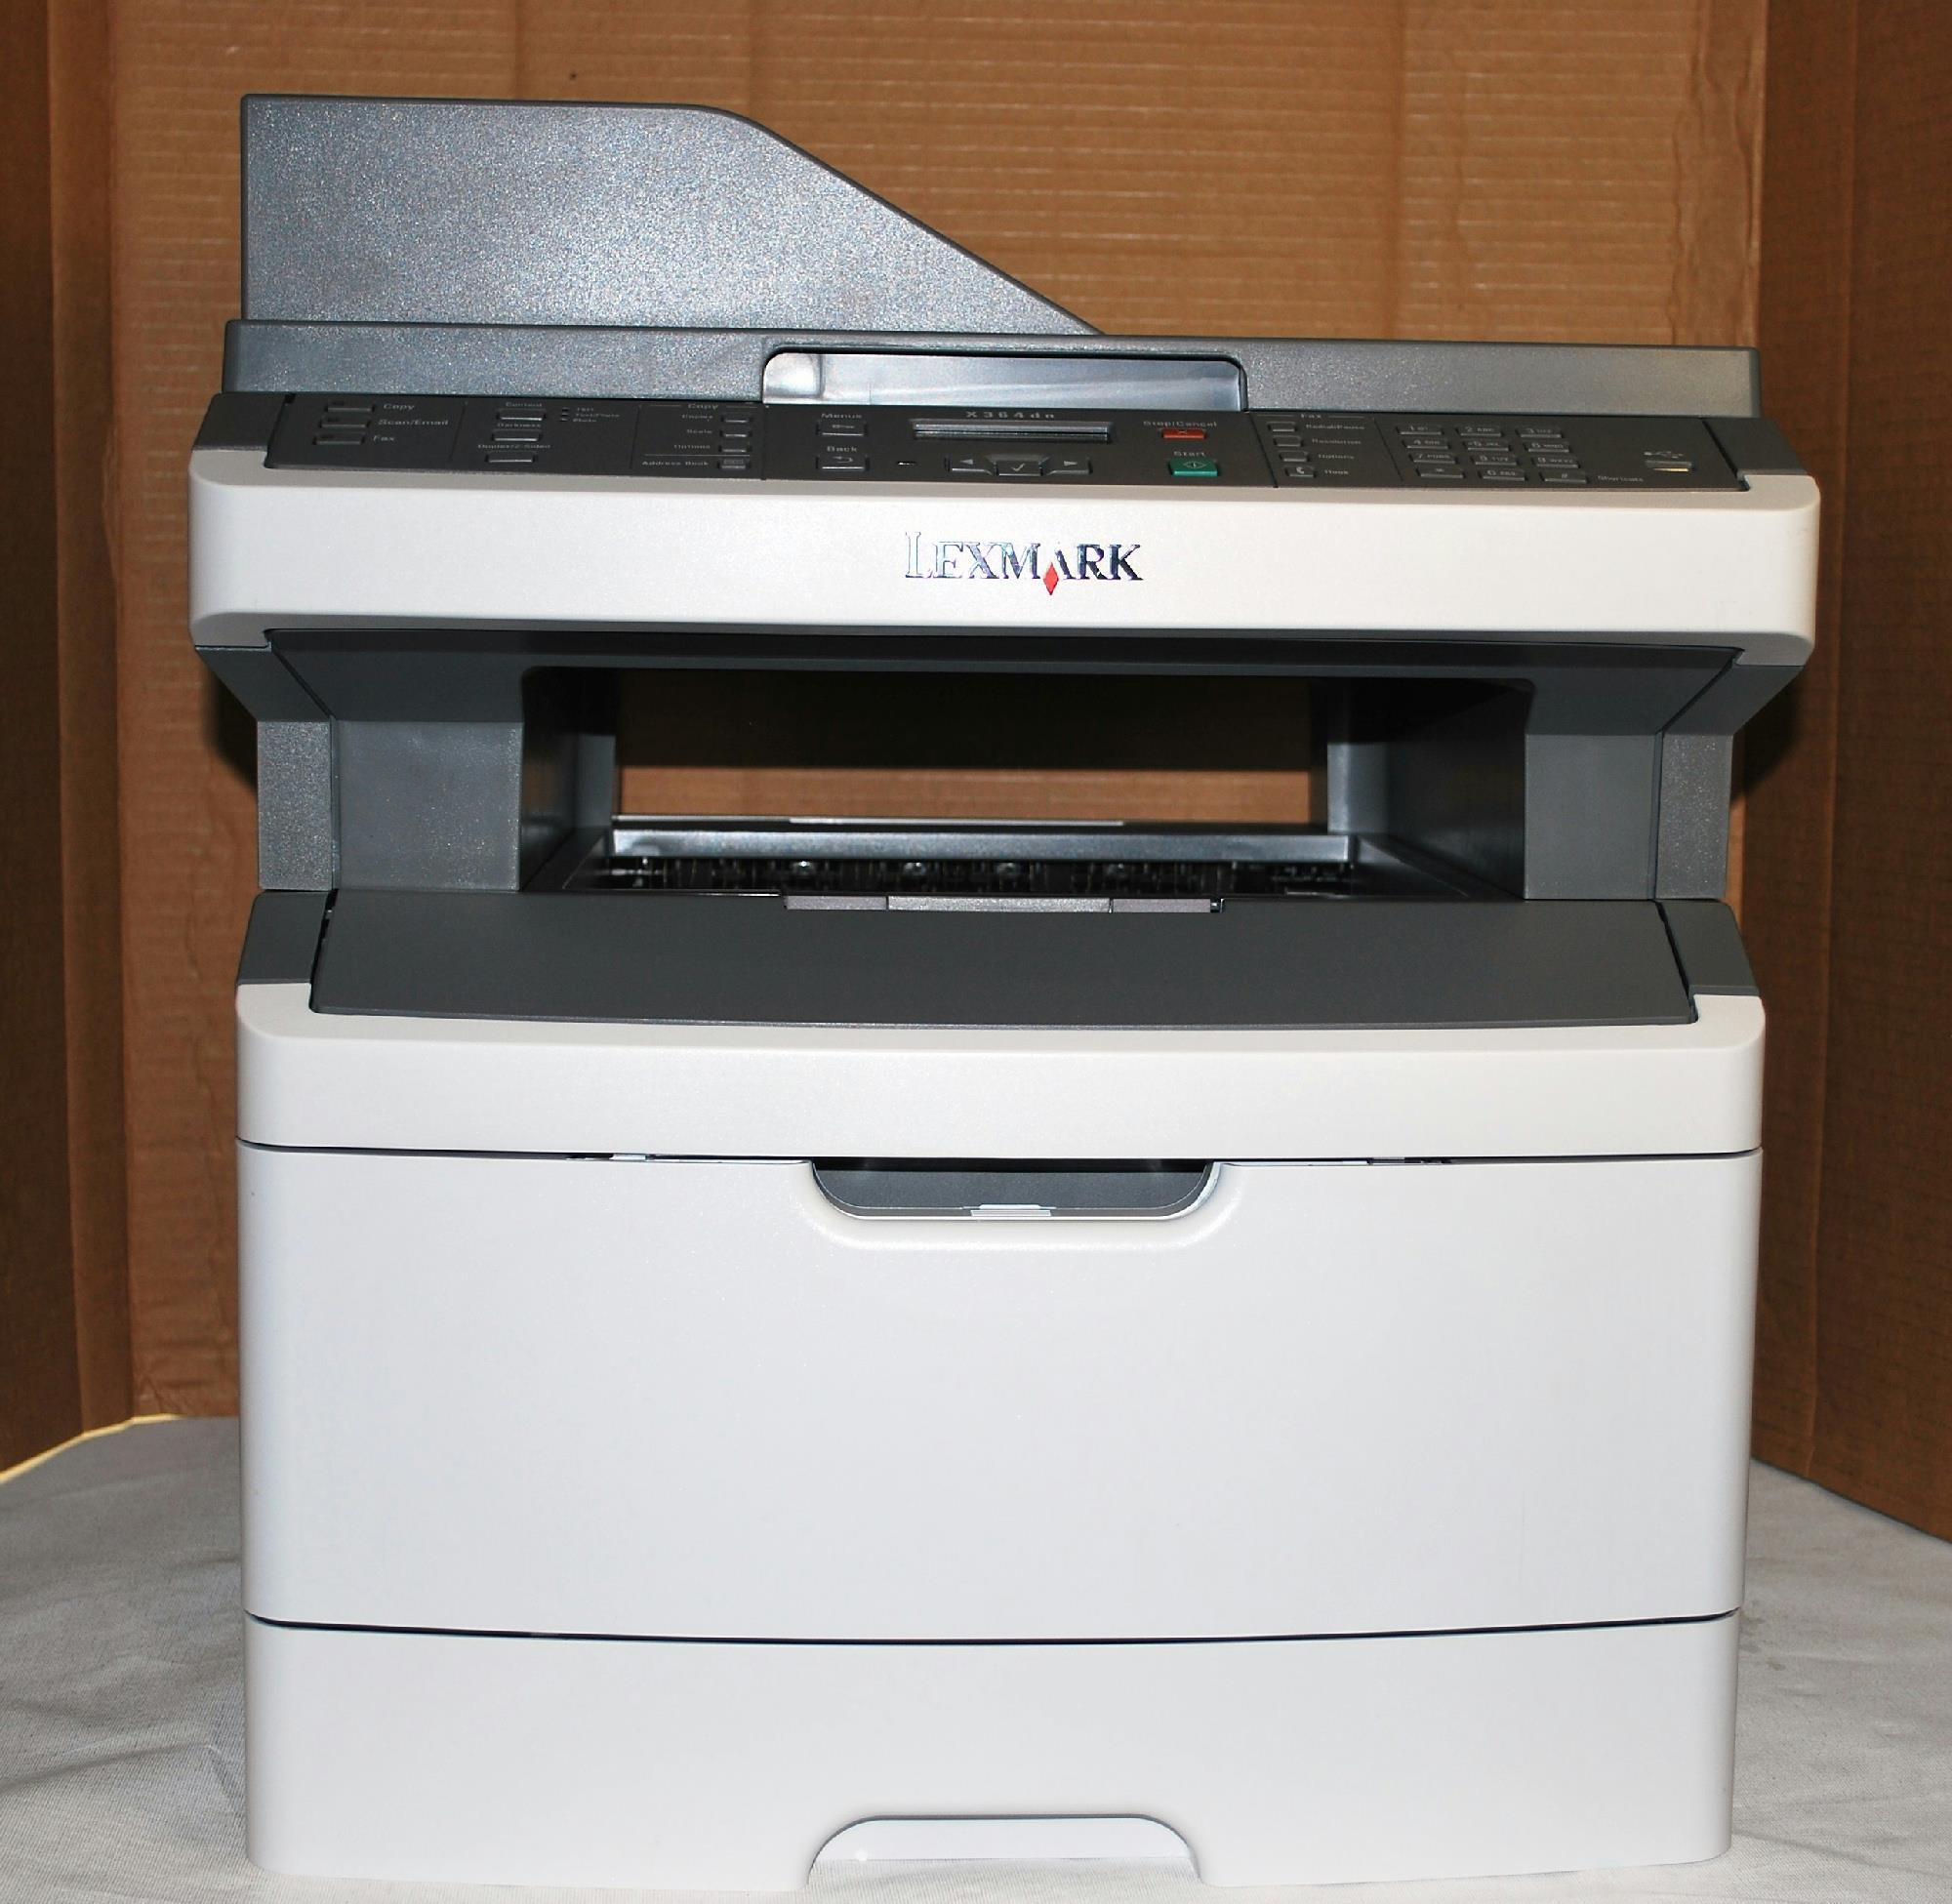 lexmark x364dn multifunction mono printer for parts 13b0637 rh ebay com lexmark x264dn maintenance manual lexmark x264dn service manual pdf